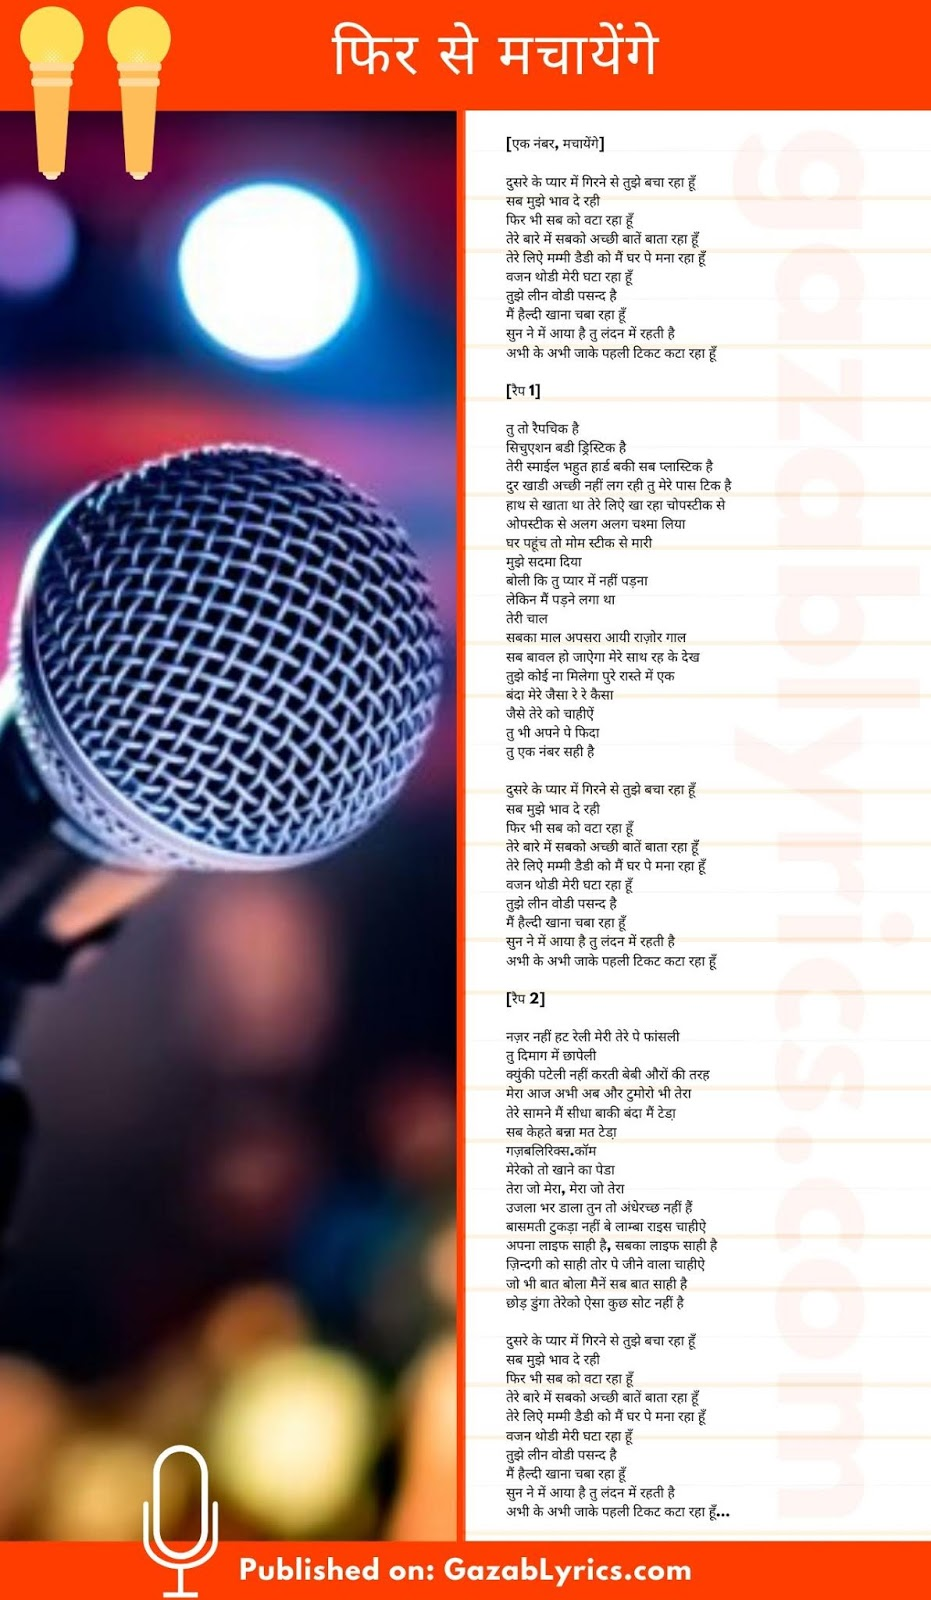 Firse Machayenge song lyrics image